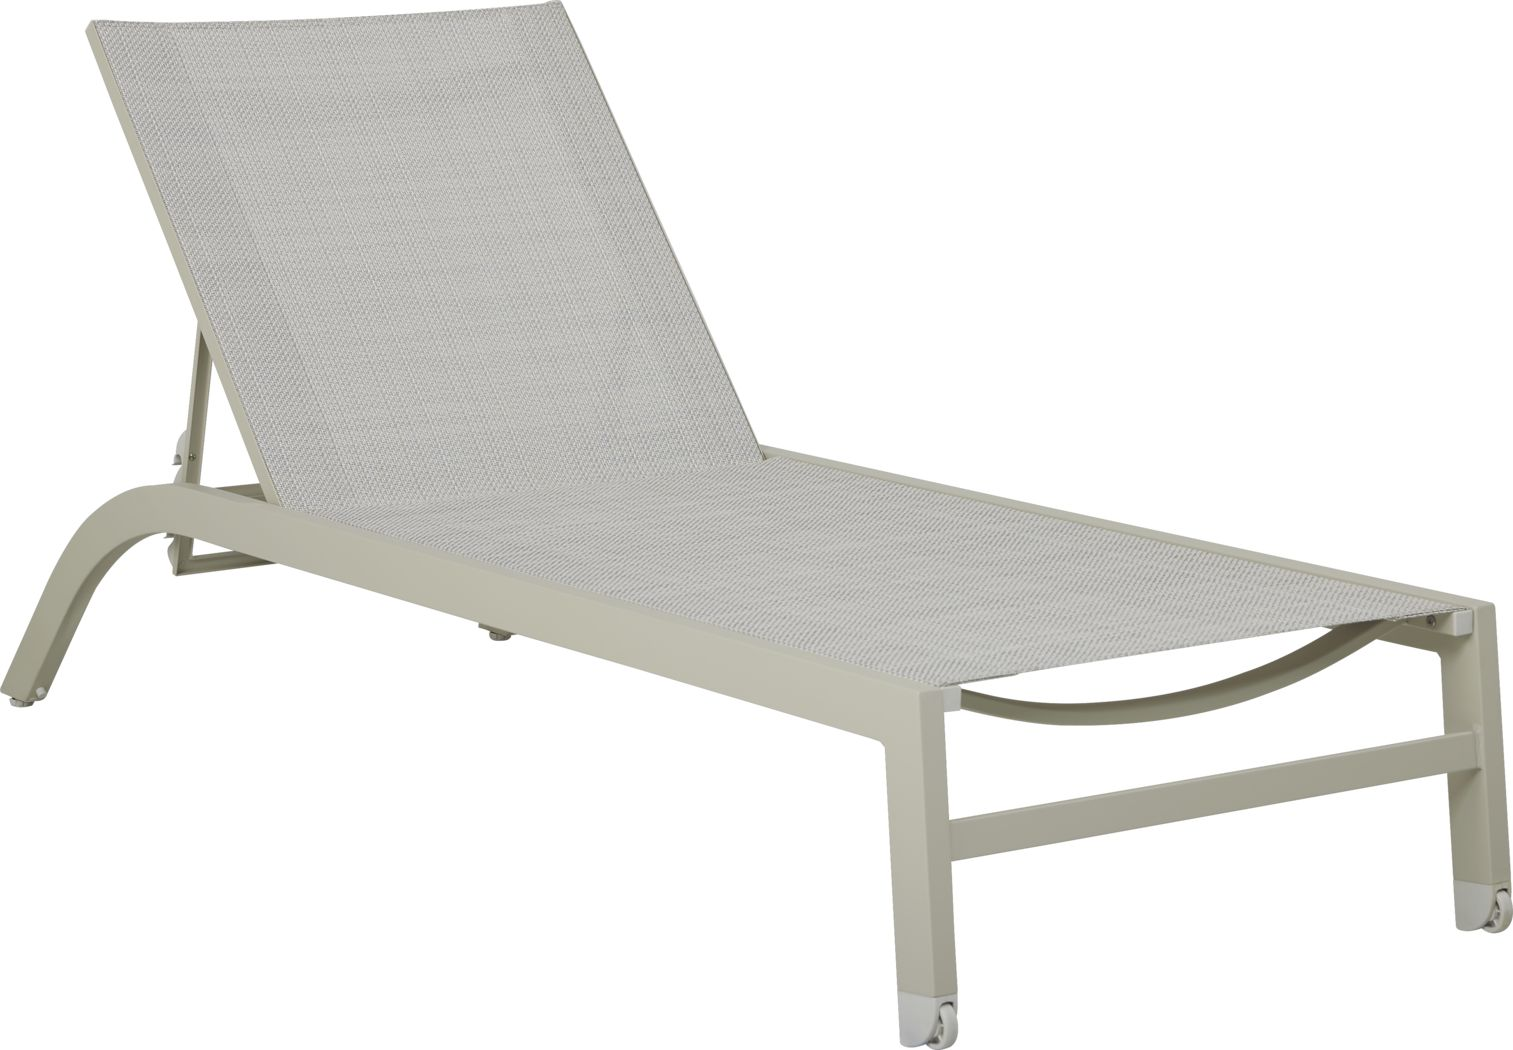 Garden View Sand Outdoor Chaise